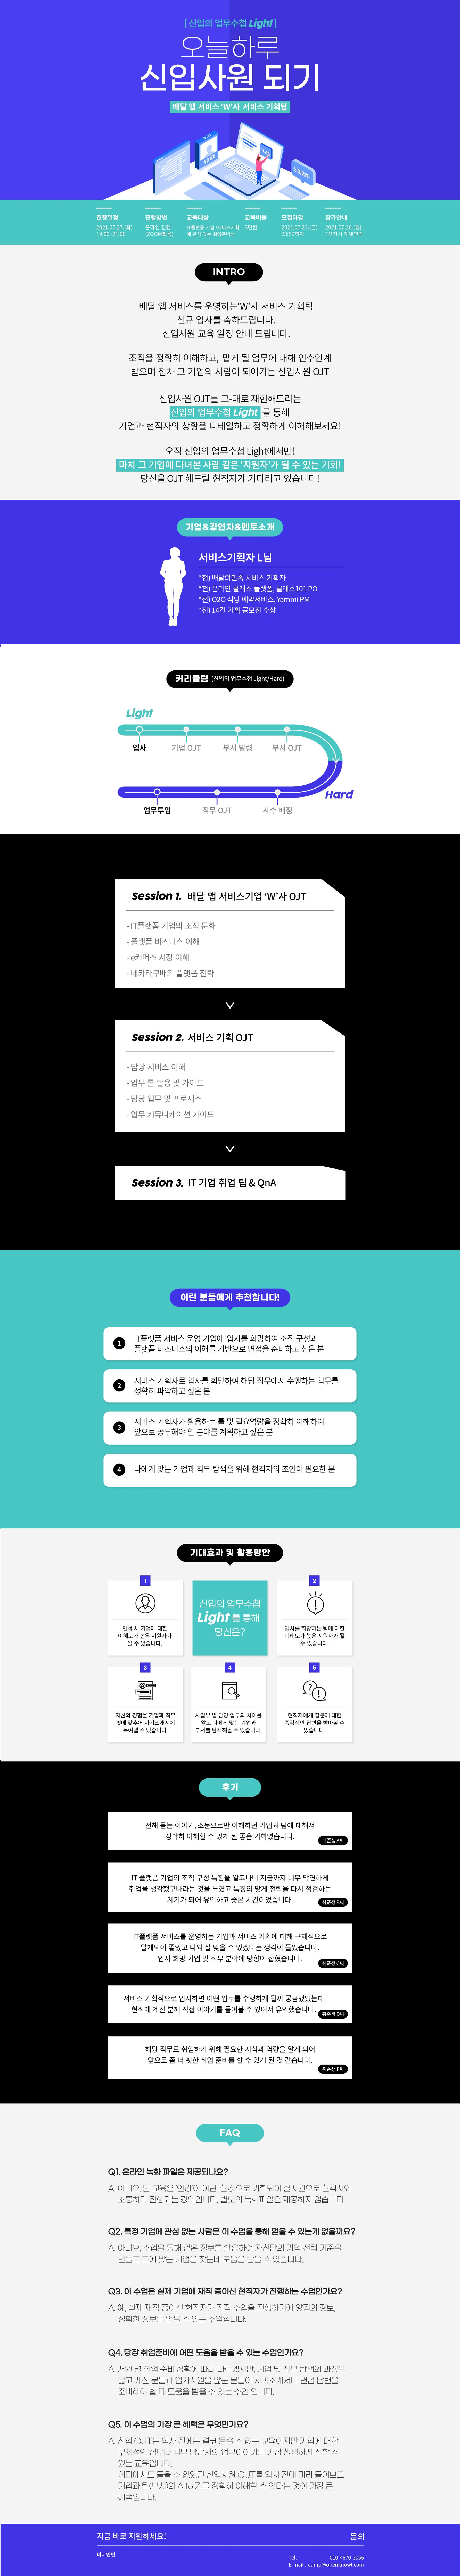 No.9 신입의 업무수첩 Light <배달 앱 서비스 'W'사 서비스기획팀편>